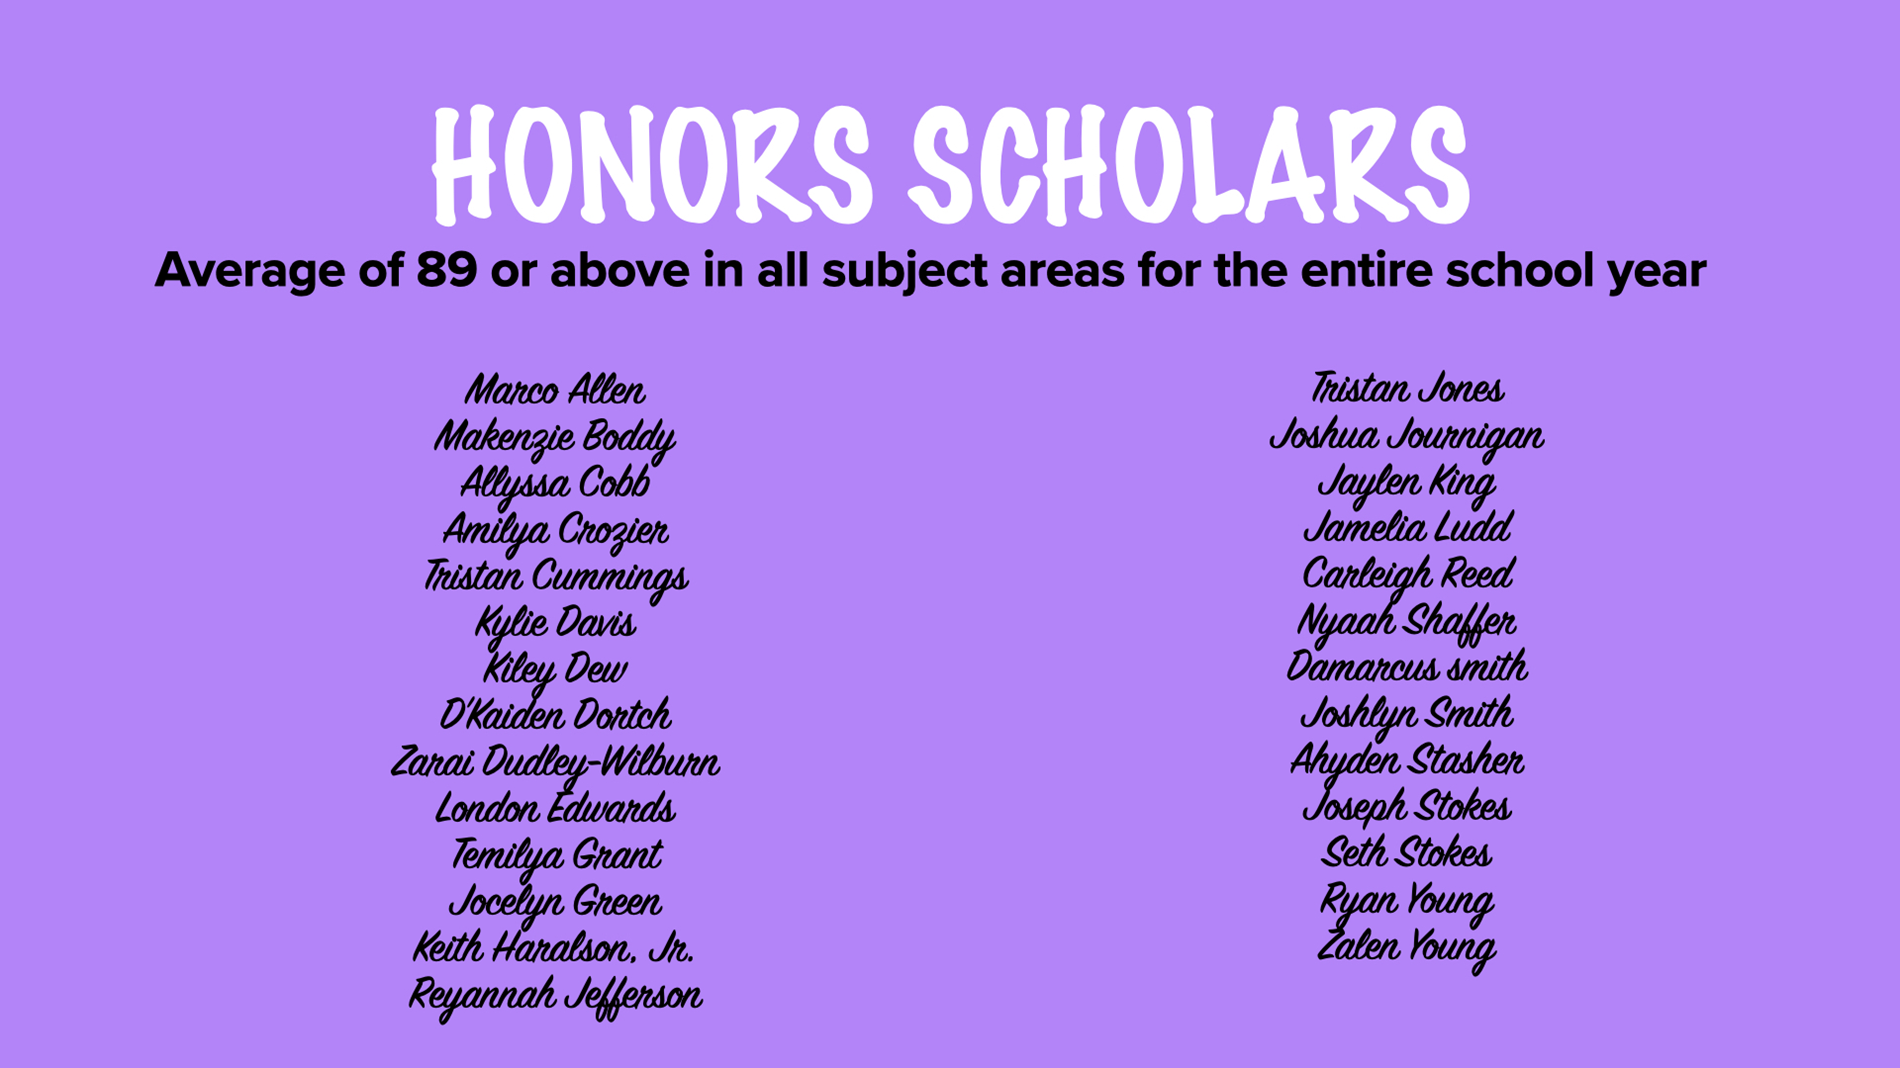 honors scholars